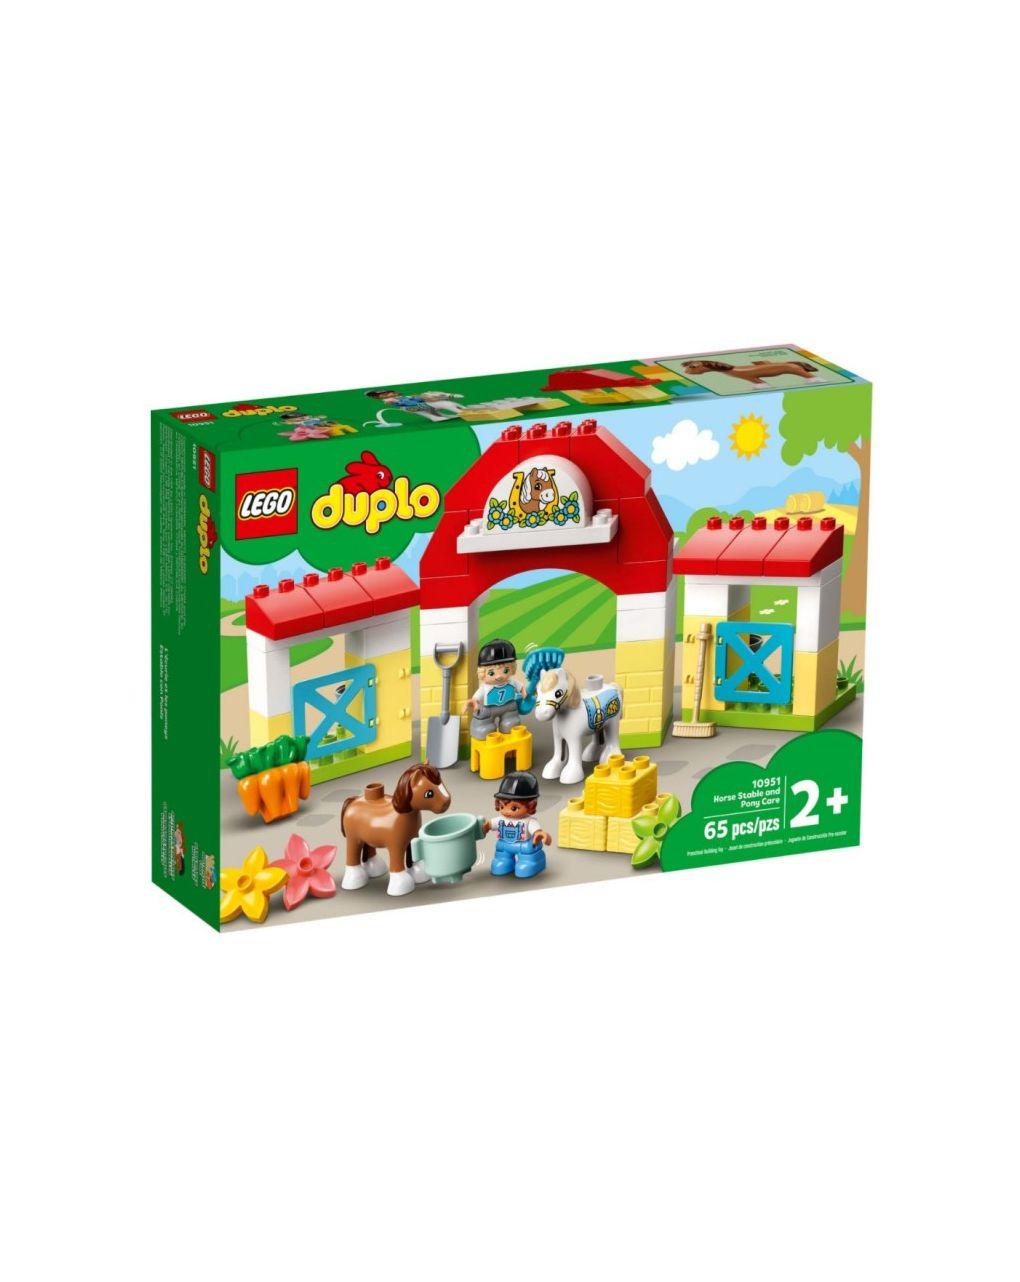 Lego duplo - maneggio - LEGO Duplo